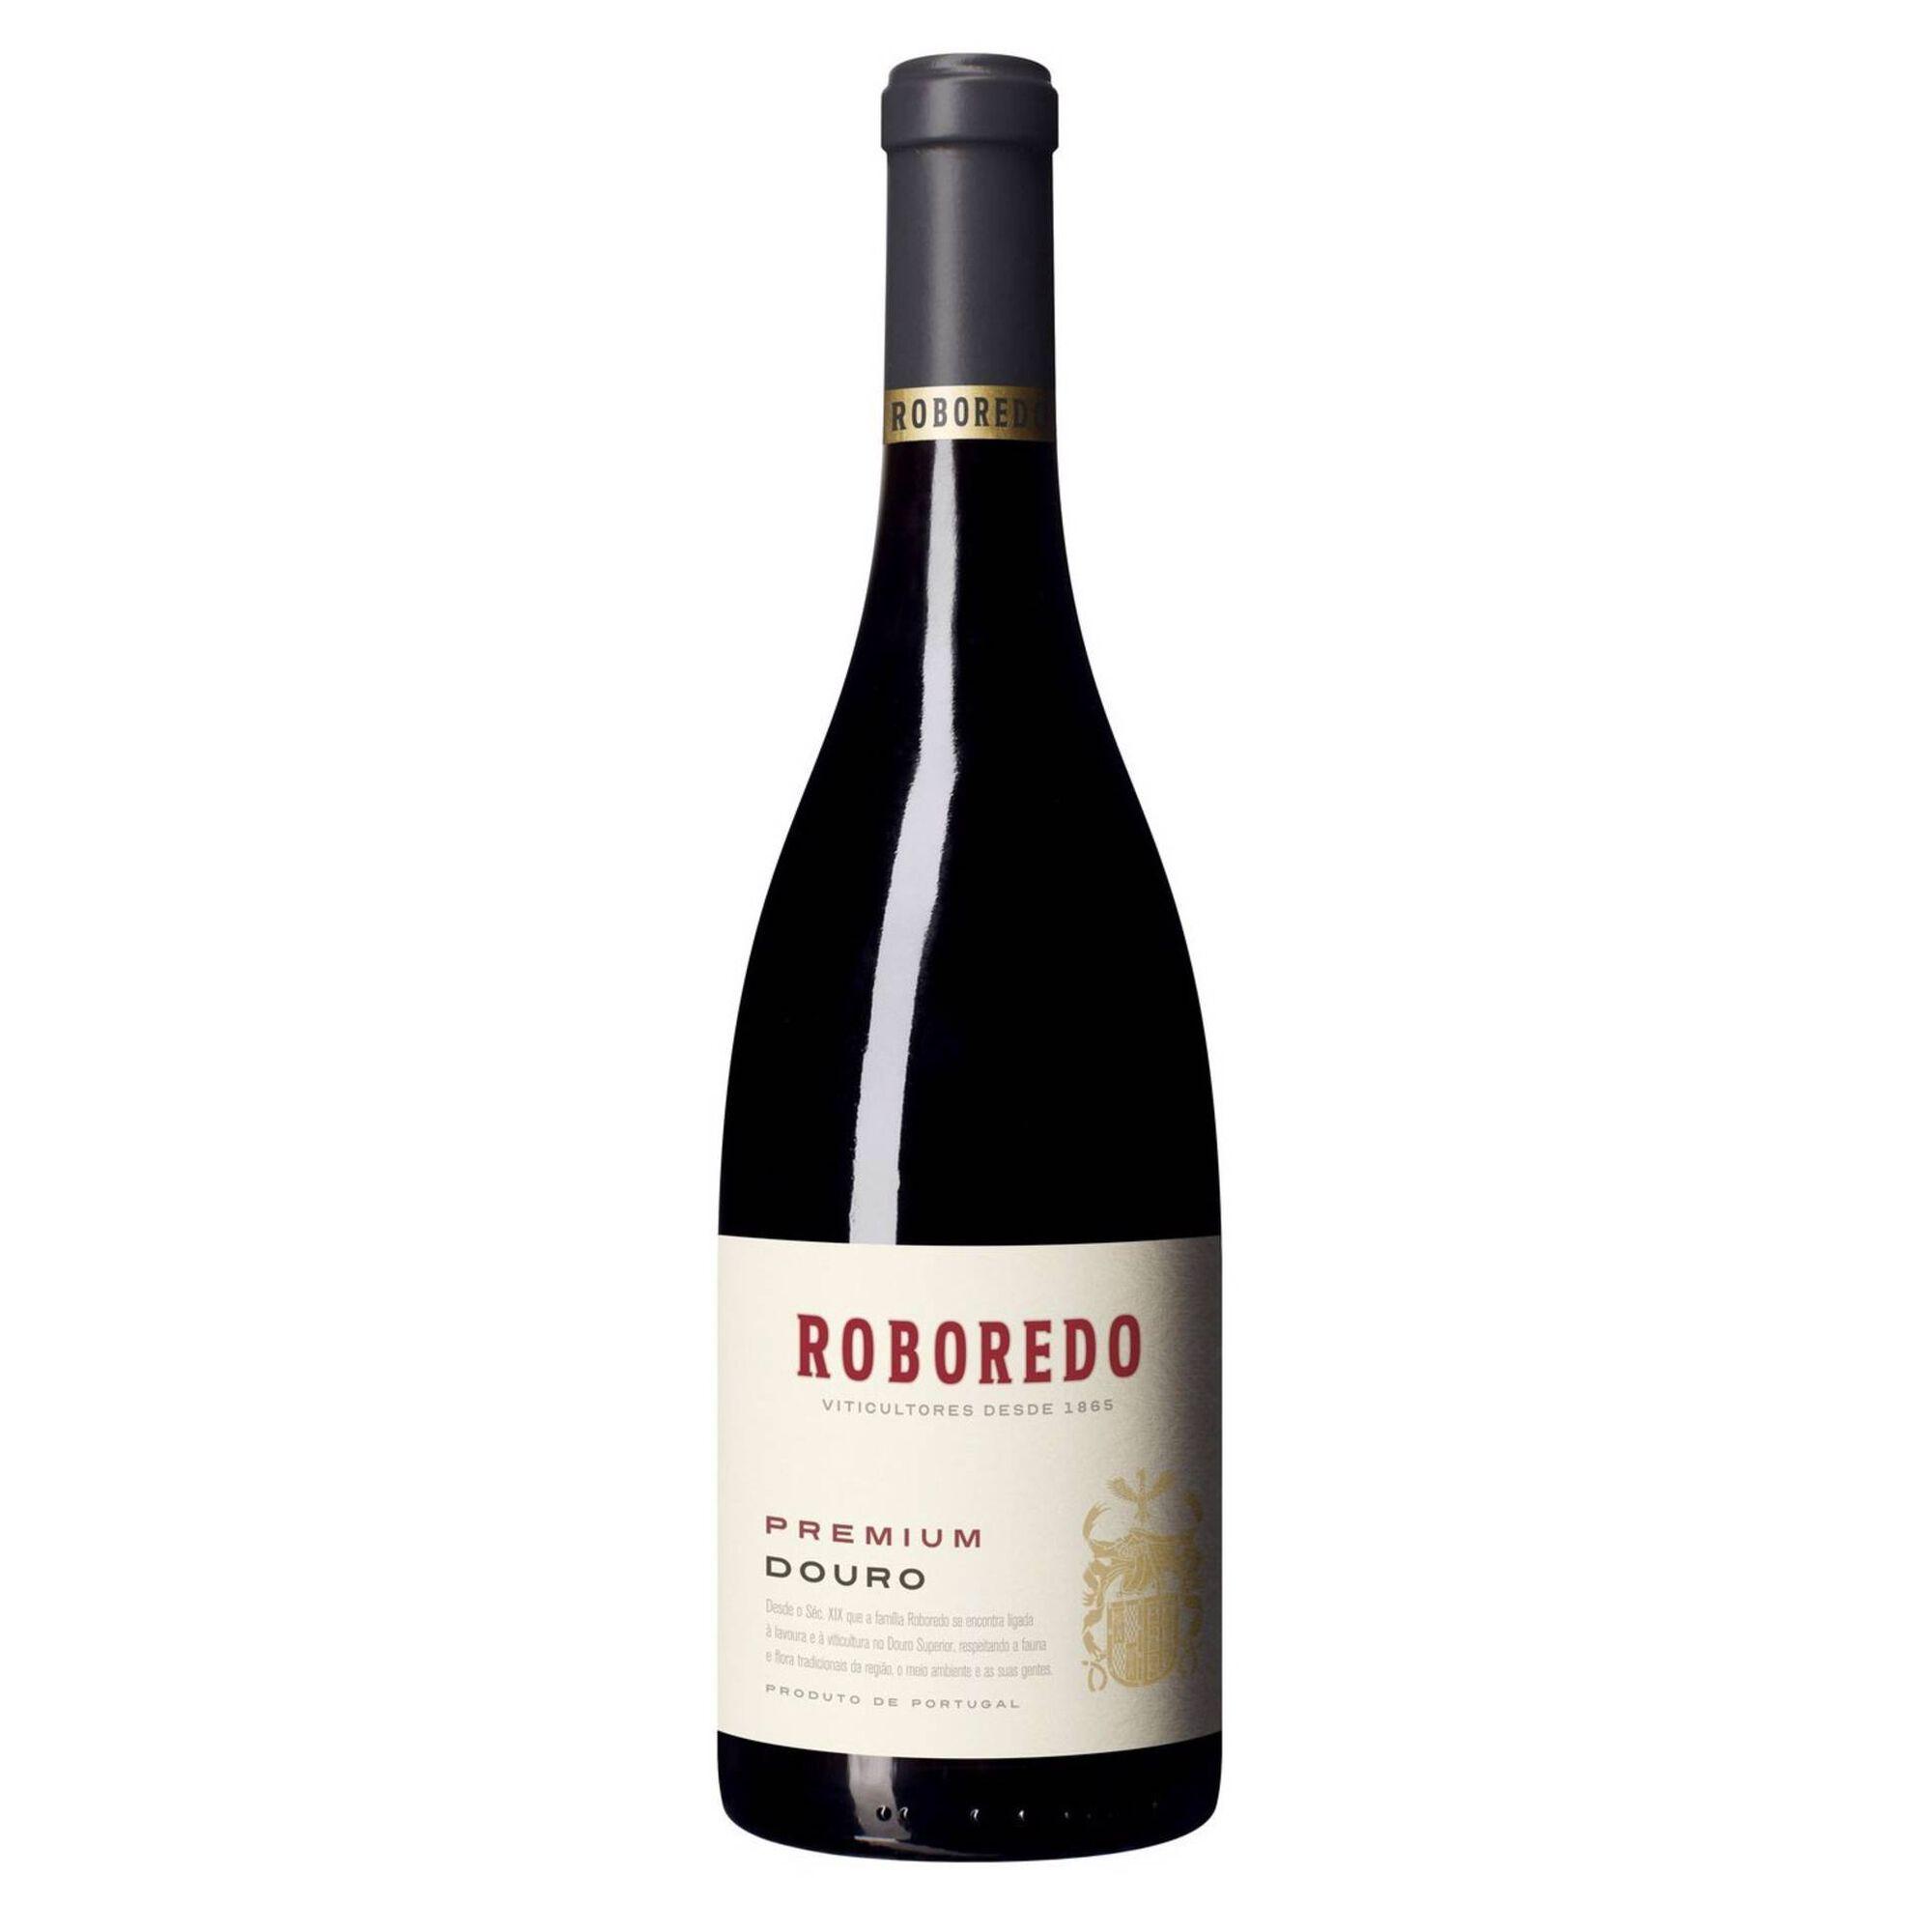 Roboredo Premium DOC Douro Vinho Tinto